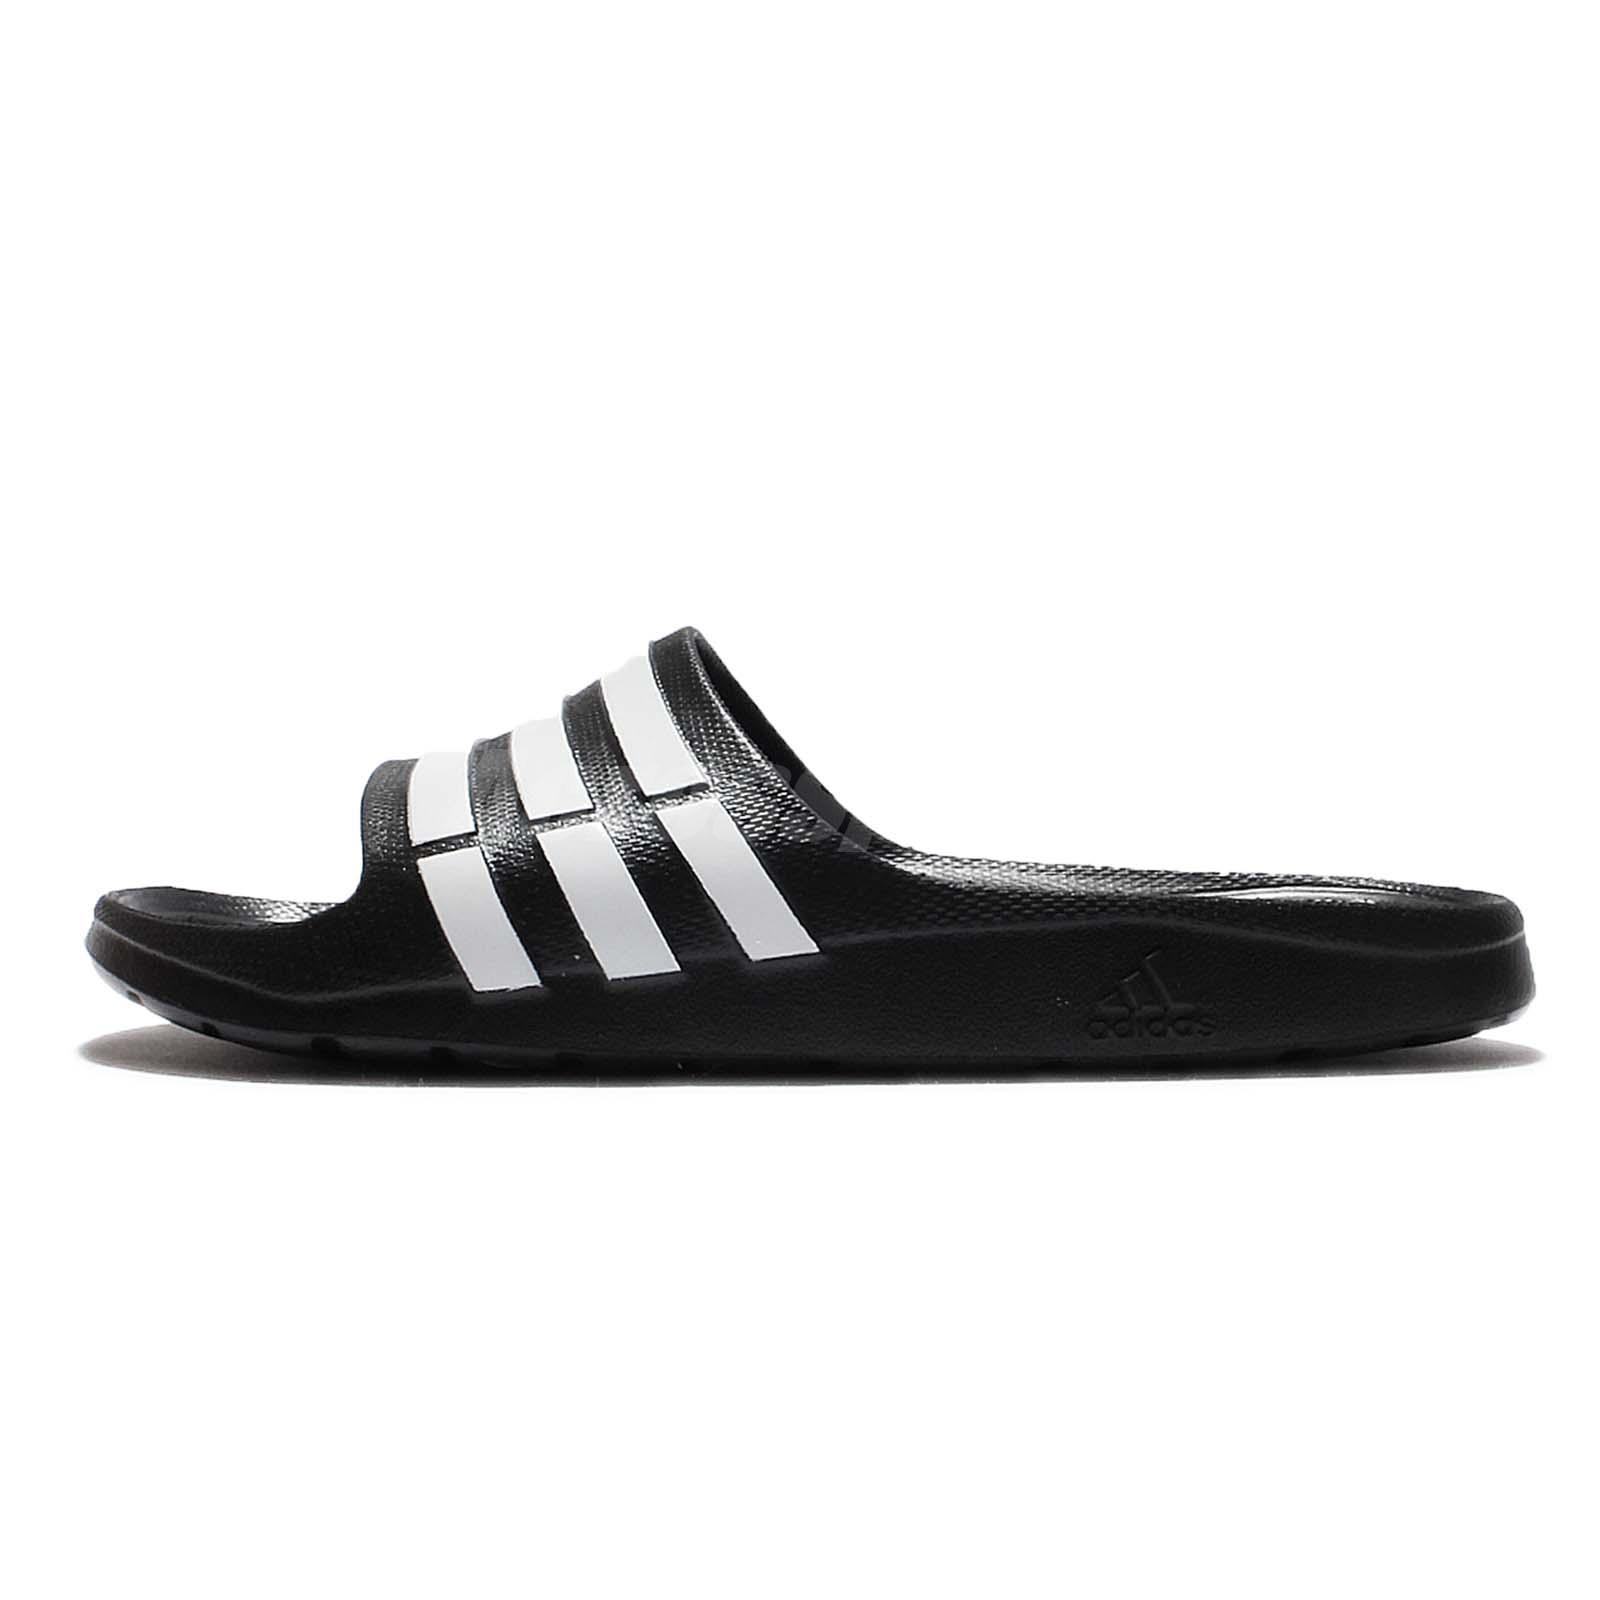 401f51f9e341b6 Buy adidas duramo slide sandal   OFF60% Discounted